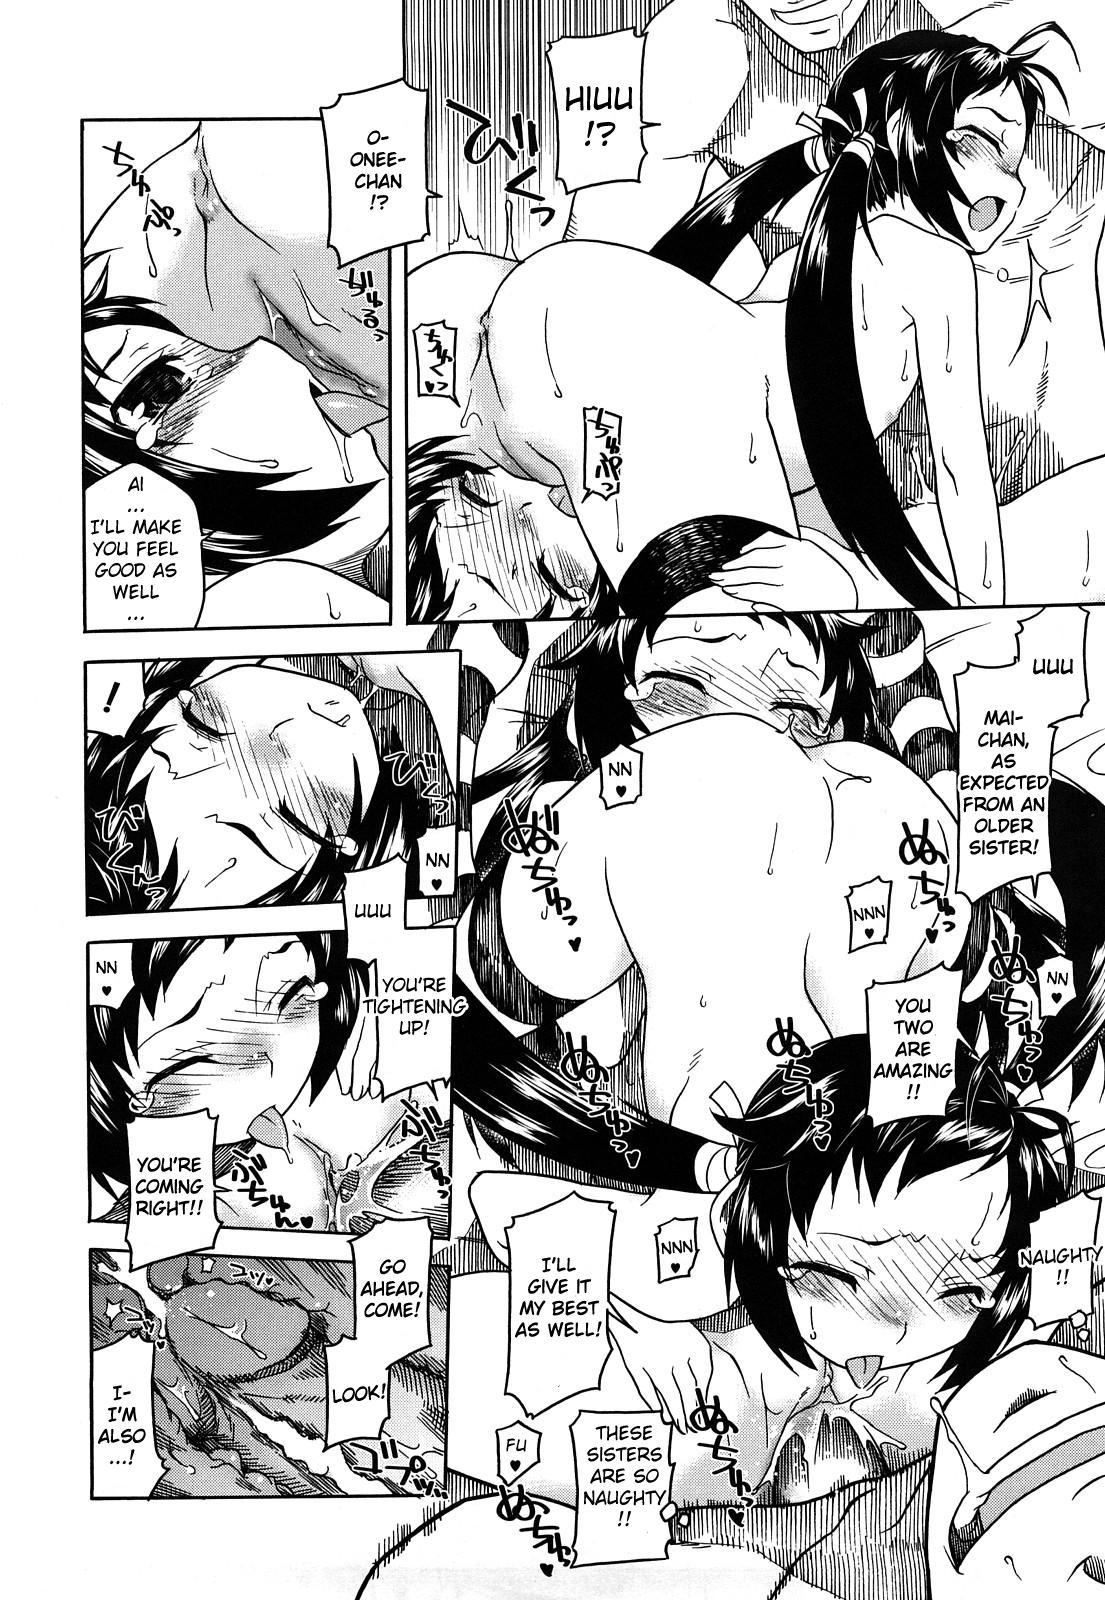 Shinkonsan Gokko Ch. 9 - Show Us Your Penis 17